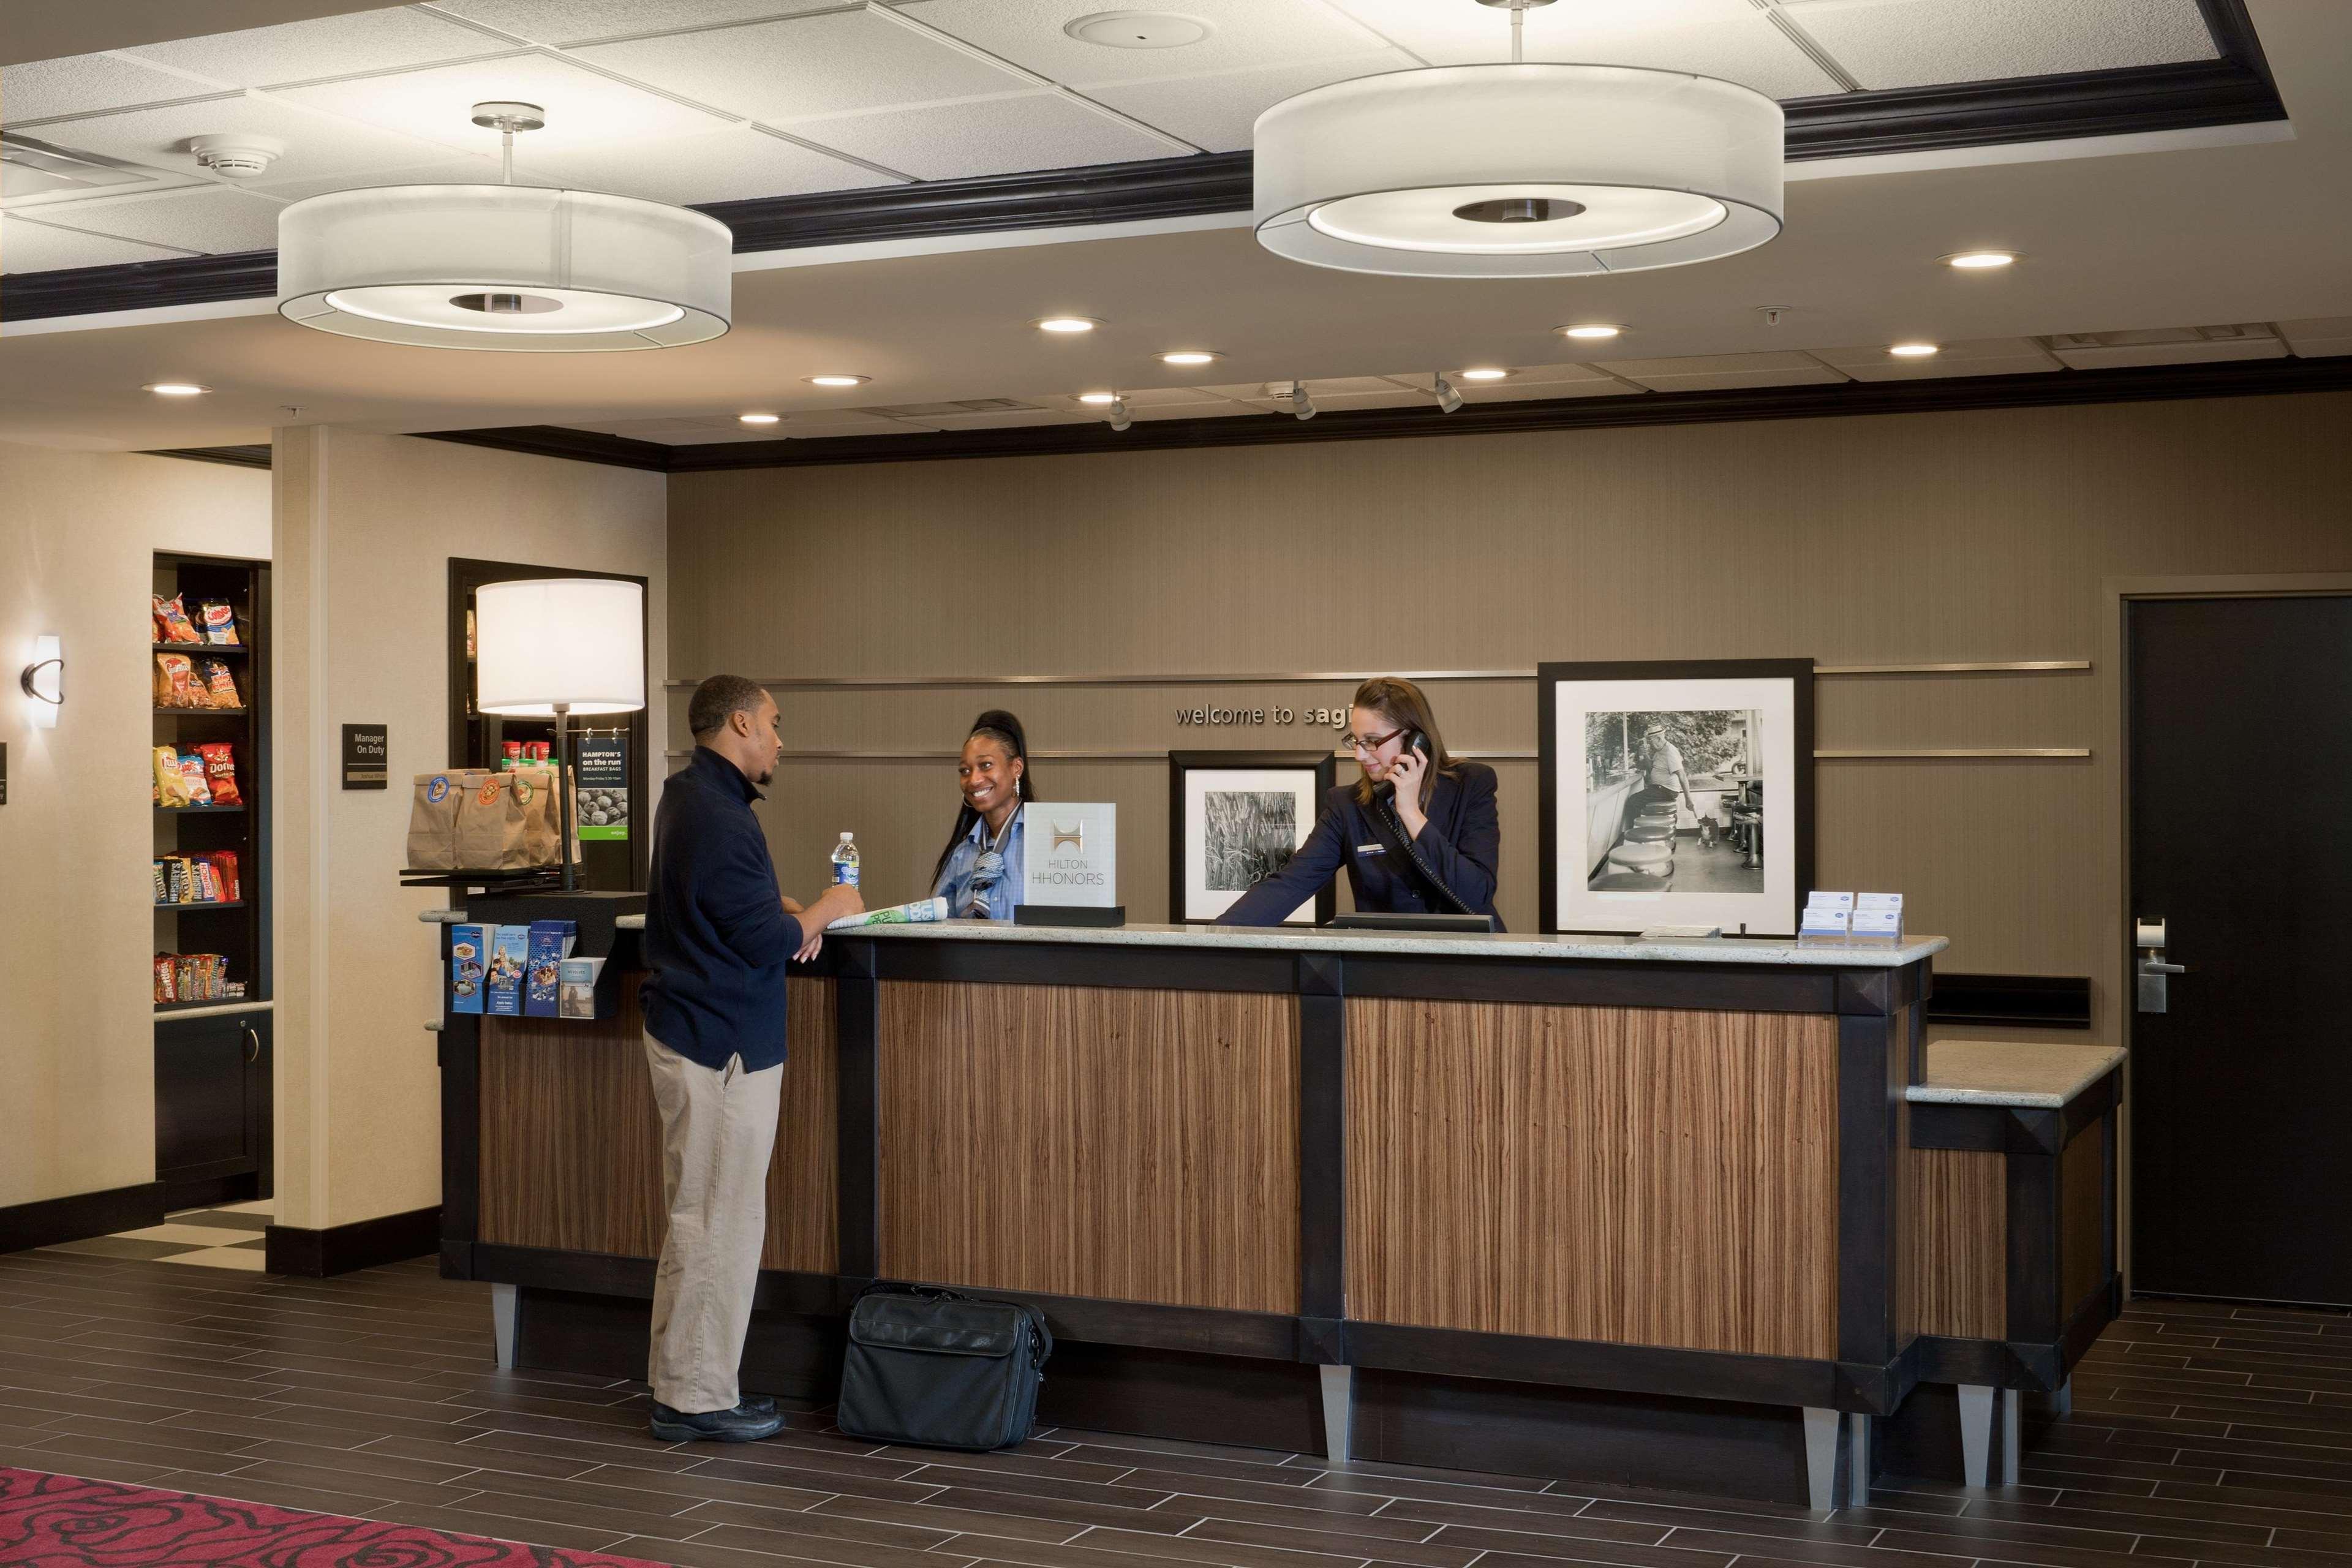 Hampton Inn & Suites Saginaw image 4